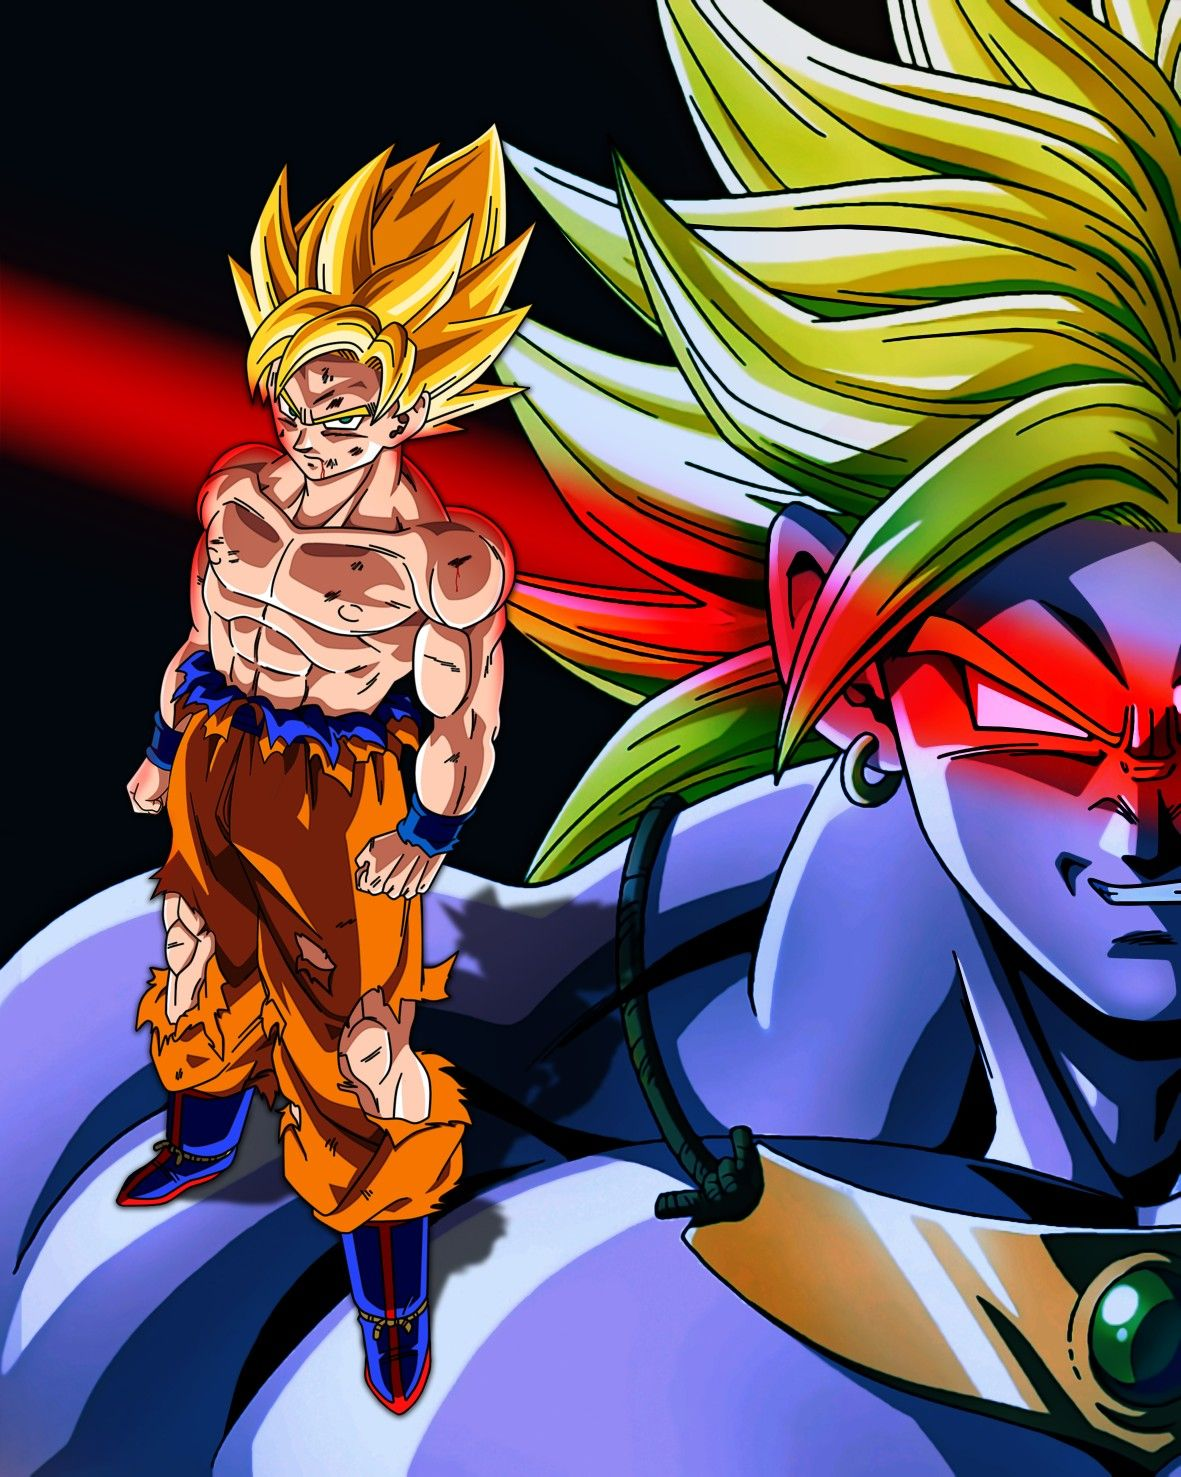 Poster Dragon Ball Z The Legendary Super Saiyan By Dony910 Dragon Ball Dragon Ball Z Dragon